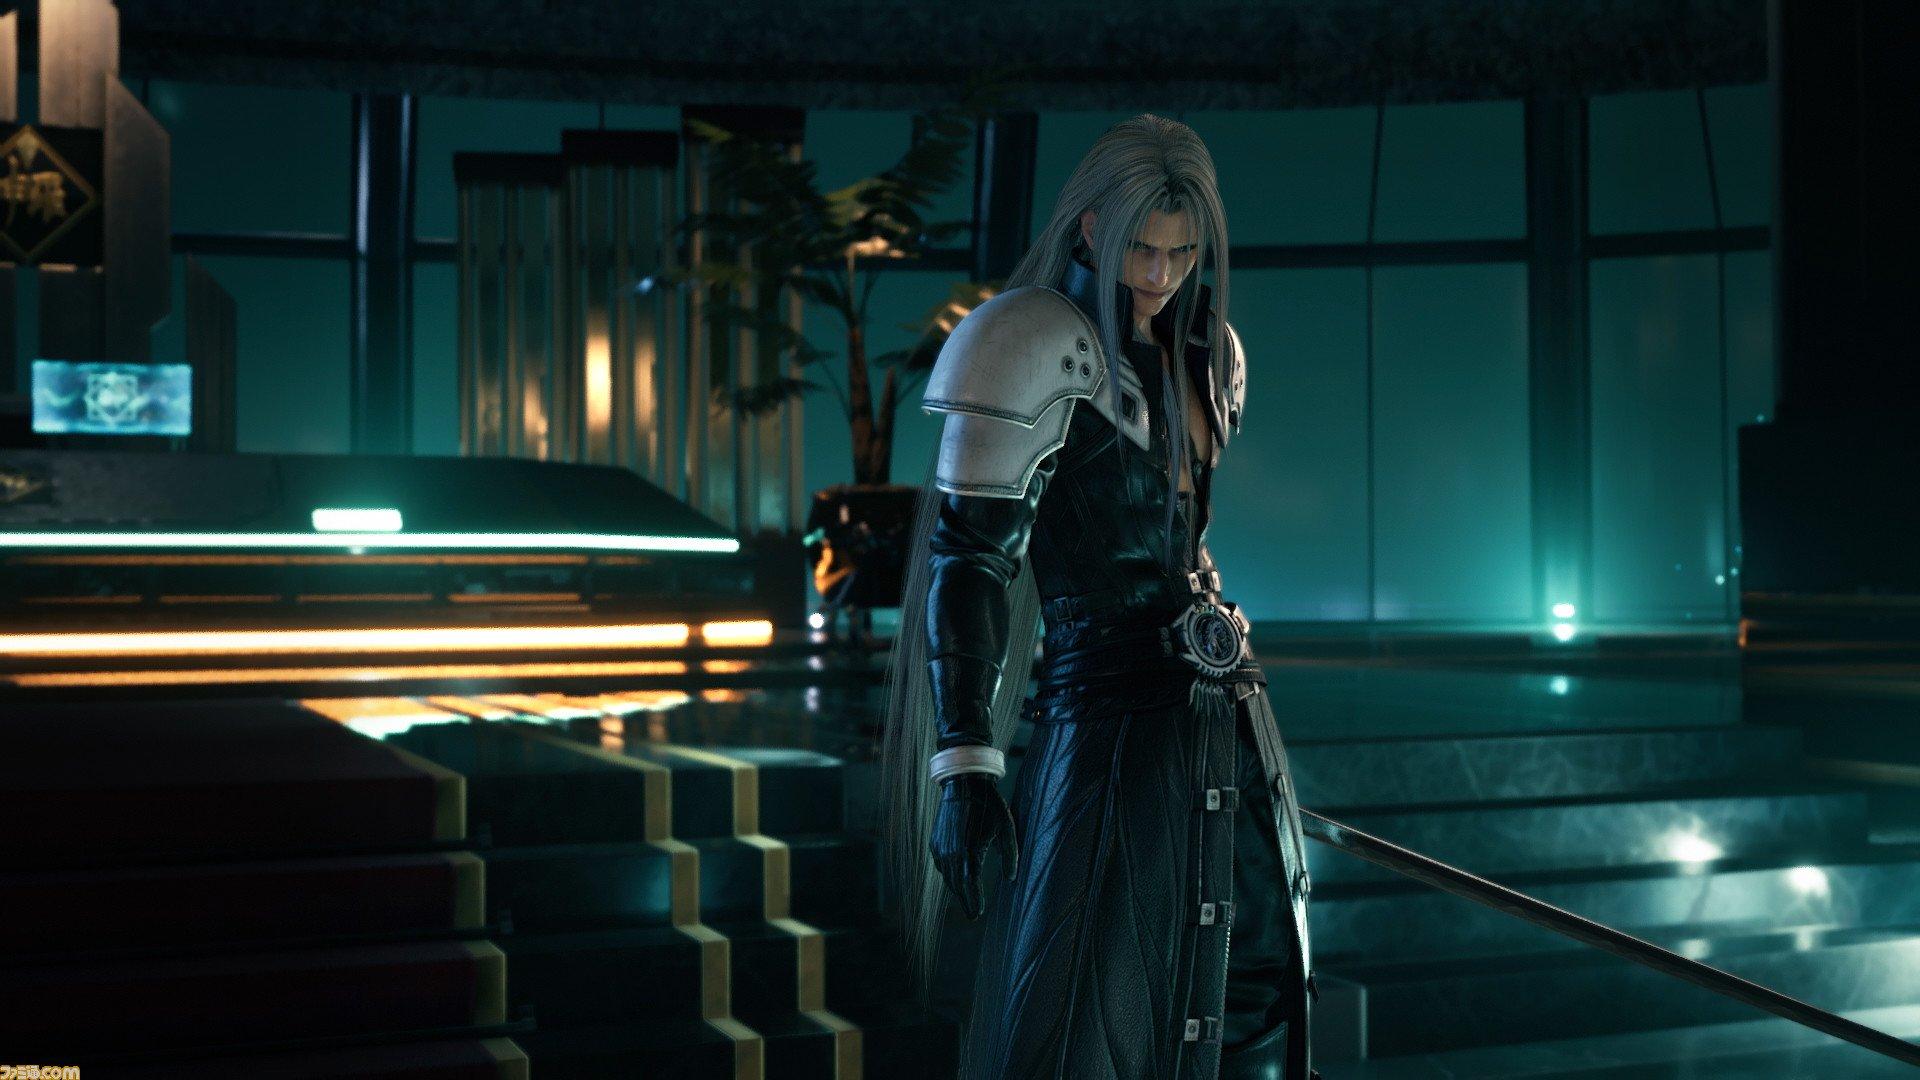 Latest Ff7 Remake Art And Screenshots Show Off Sephiroth S